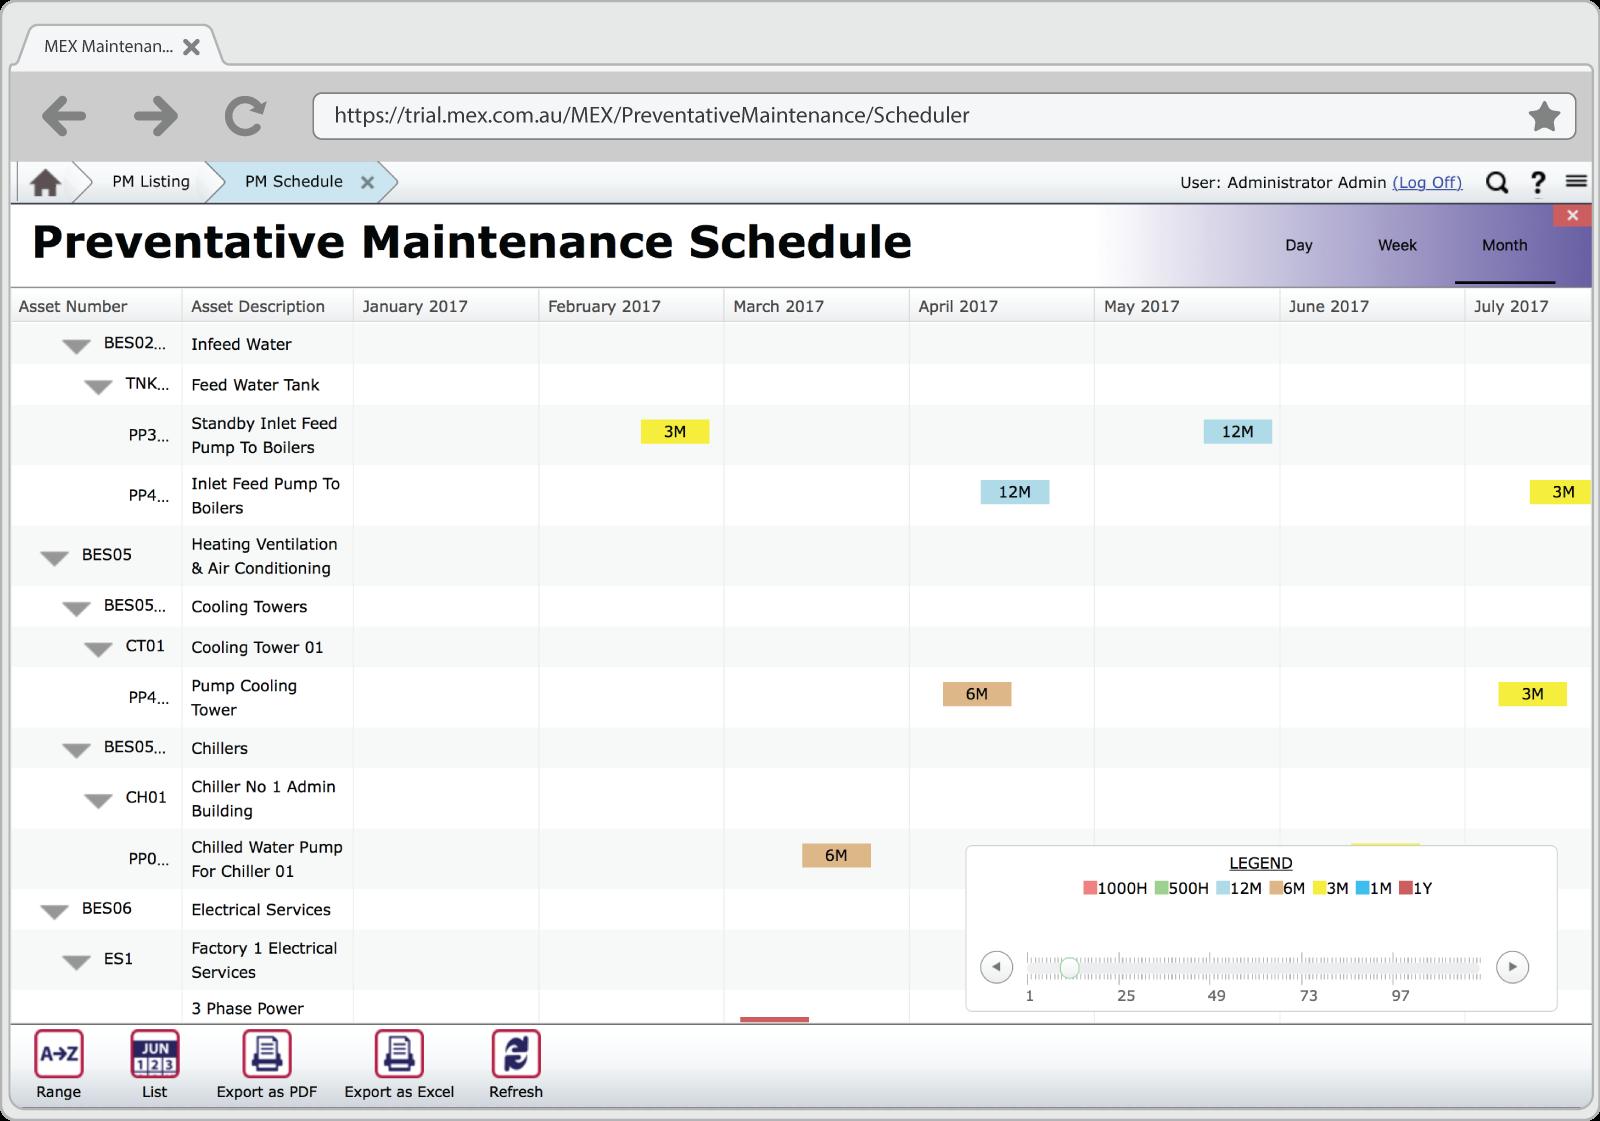 Preventative maintenance schedule